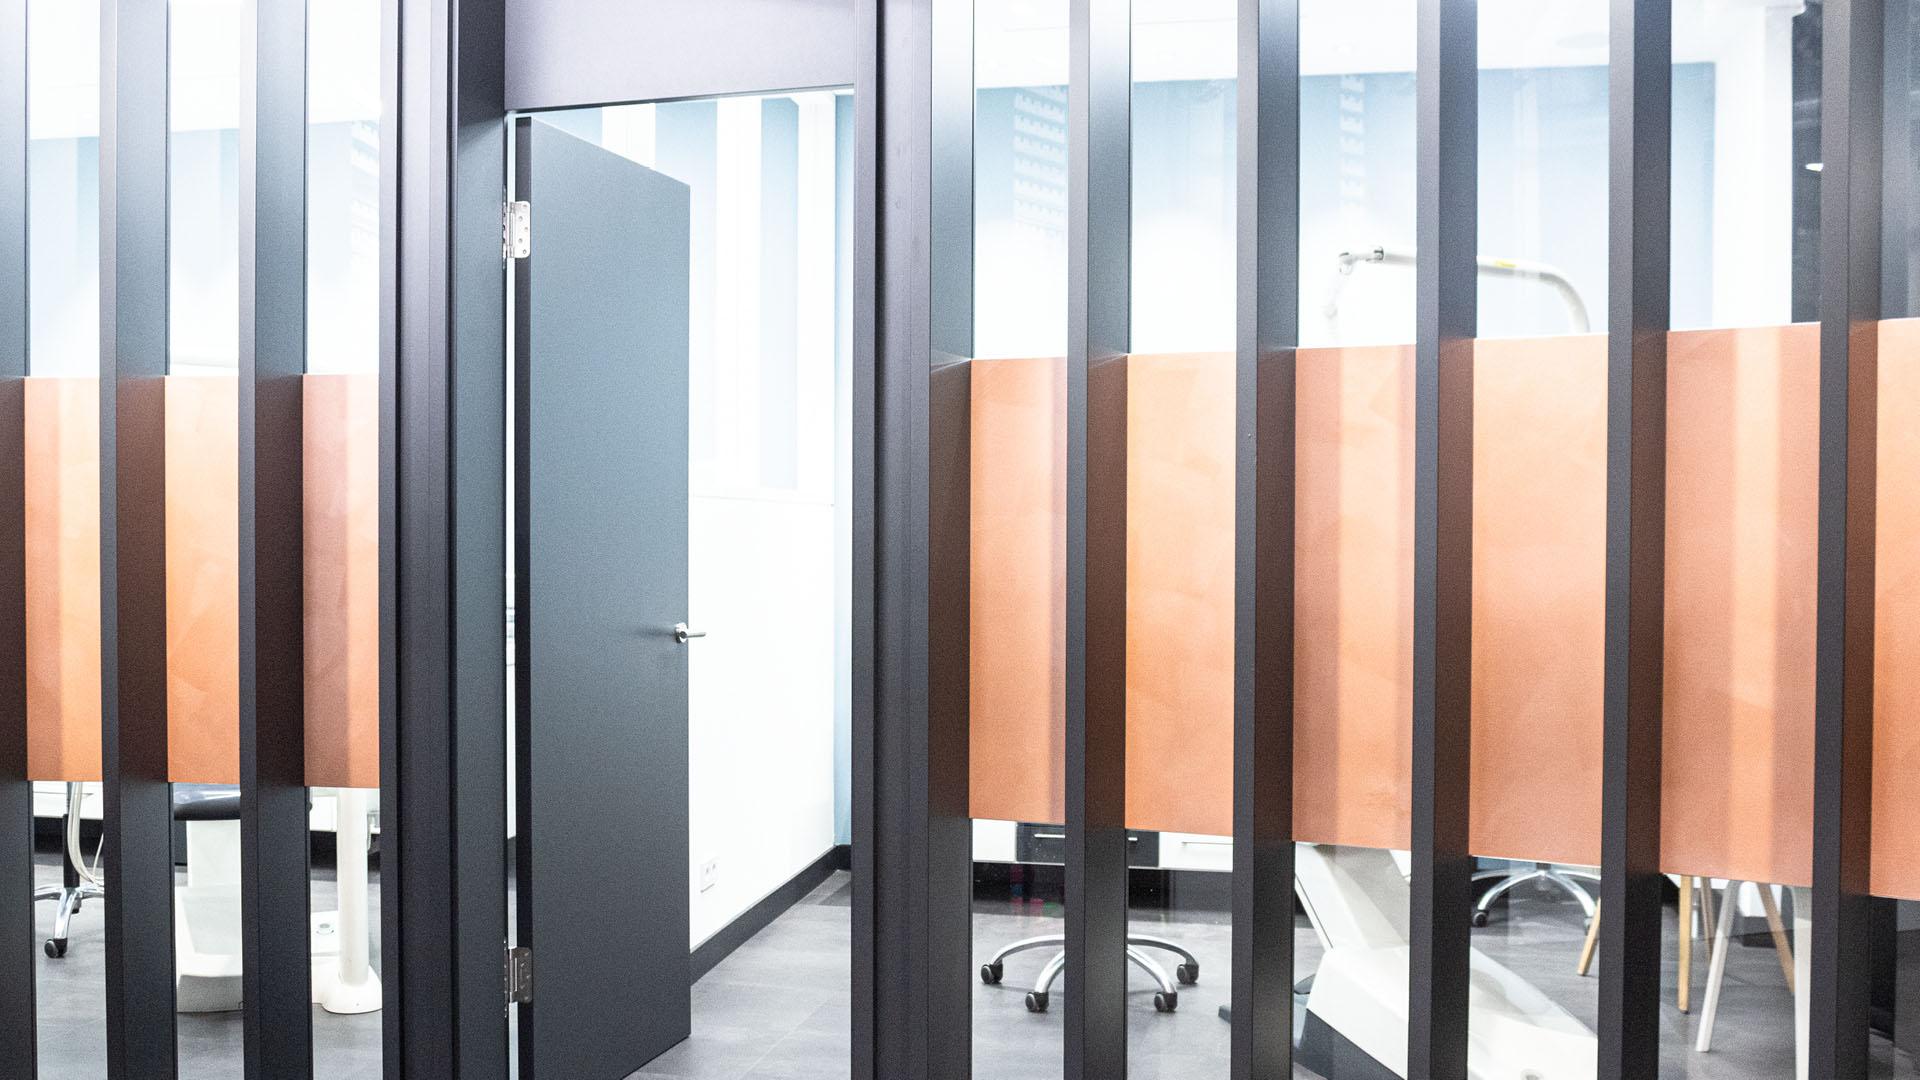 Kieferorthopäde Lohrmann Interior Design